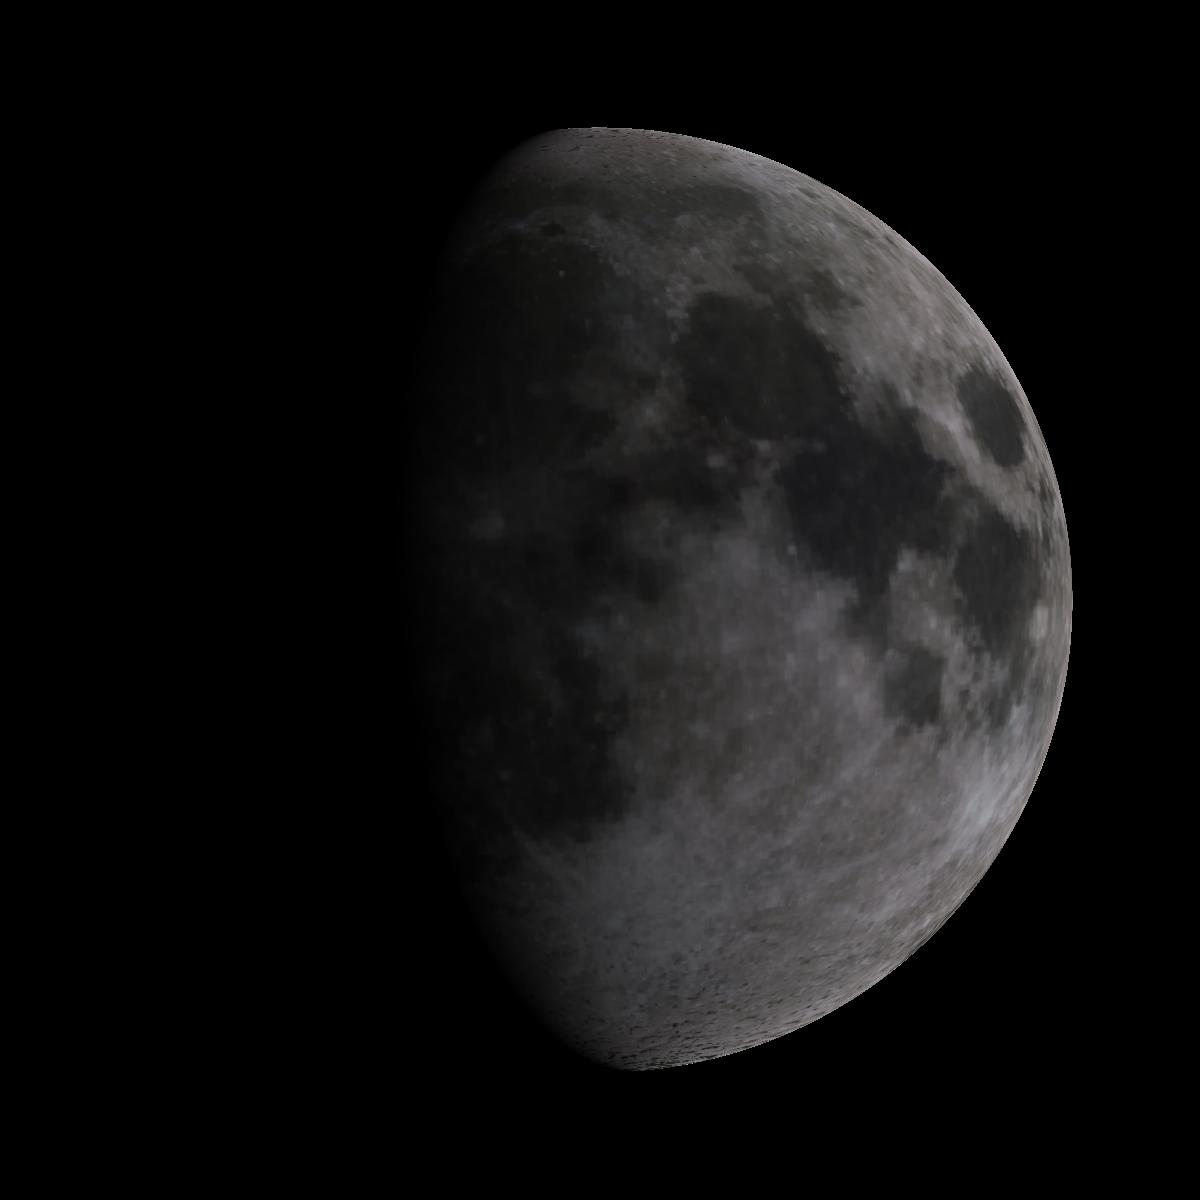 Lune du 5 mars 2020